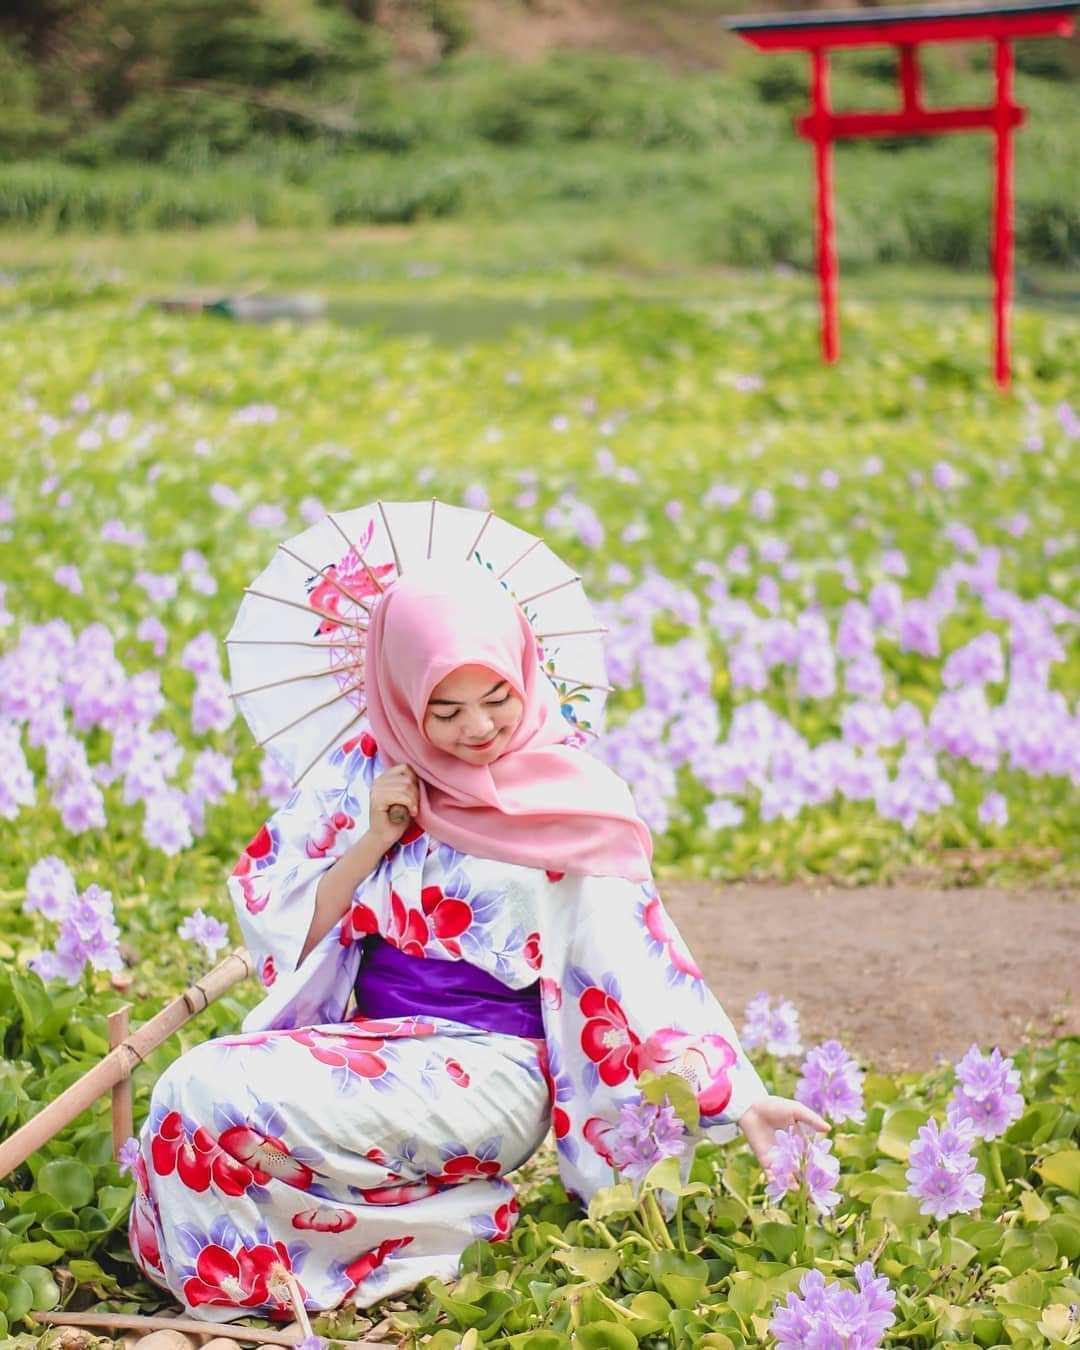 Berfoto Menggunakan Yukata Dan Payung di Kalinampu Natural Park, Image From @hanf_photography